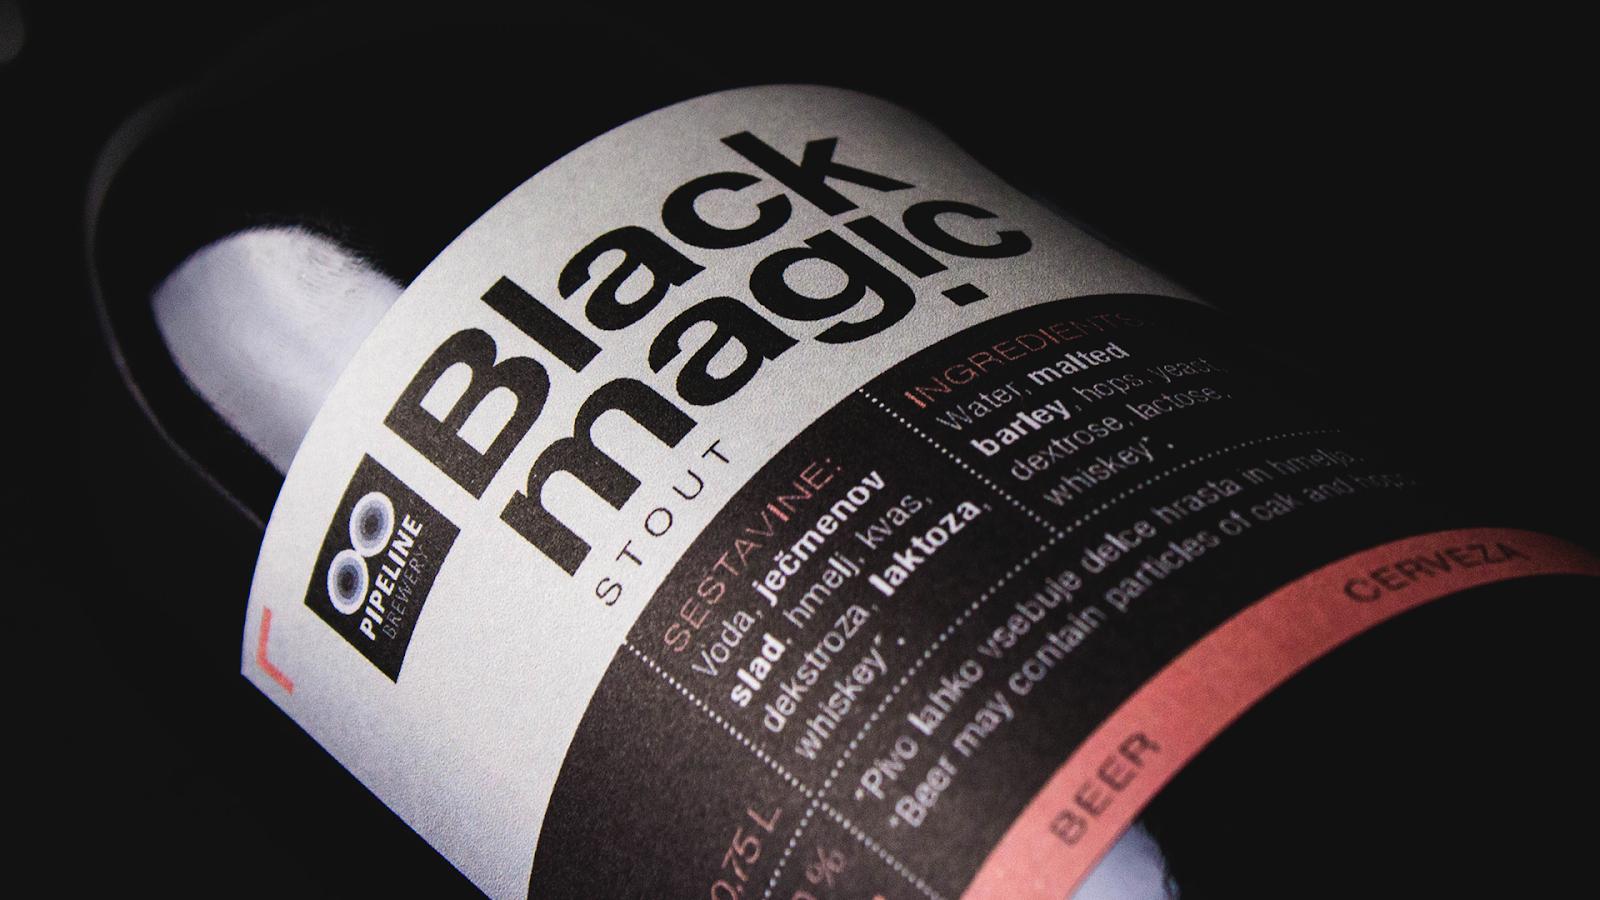 Pipeline Brewery, Black Magic Stout Packaging Design Created by Miha Avsenik